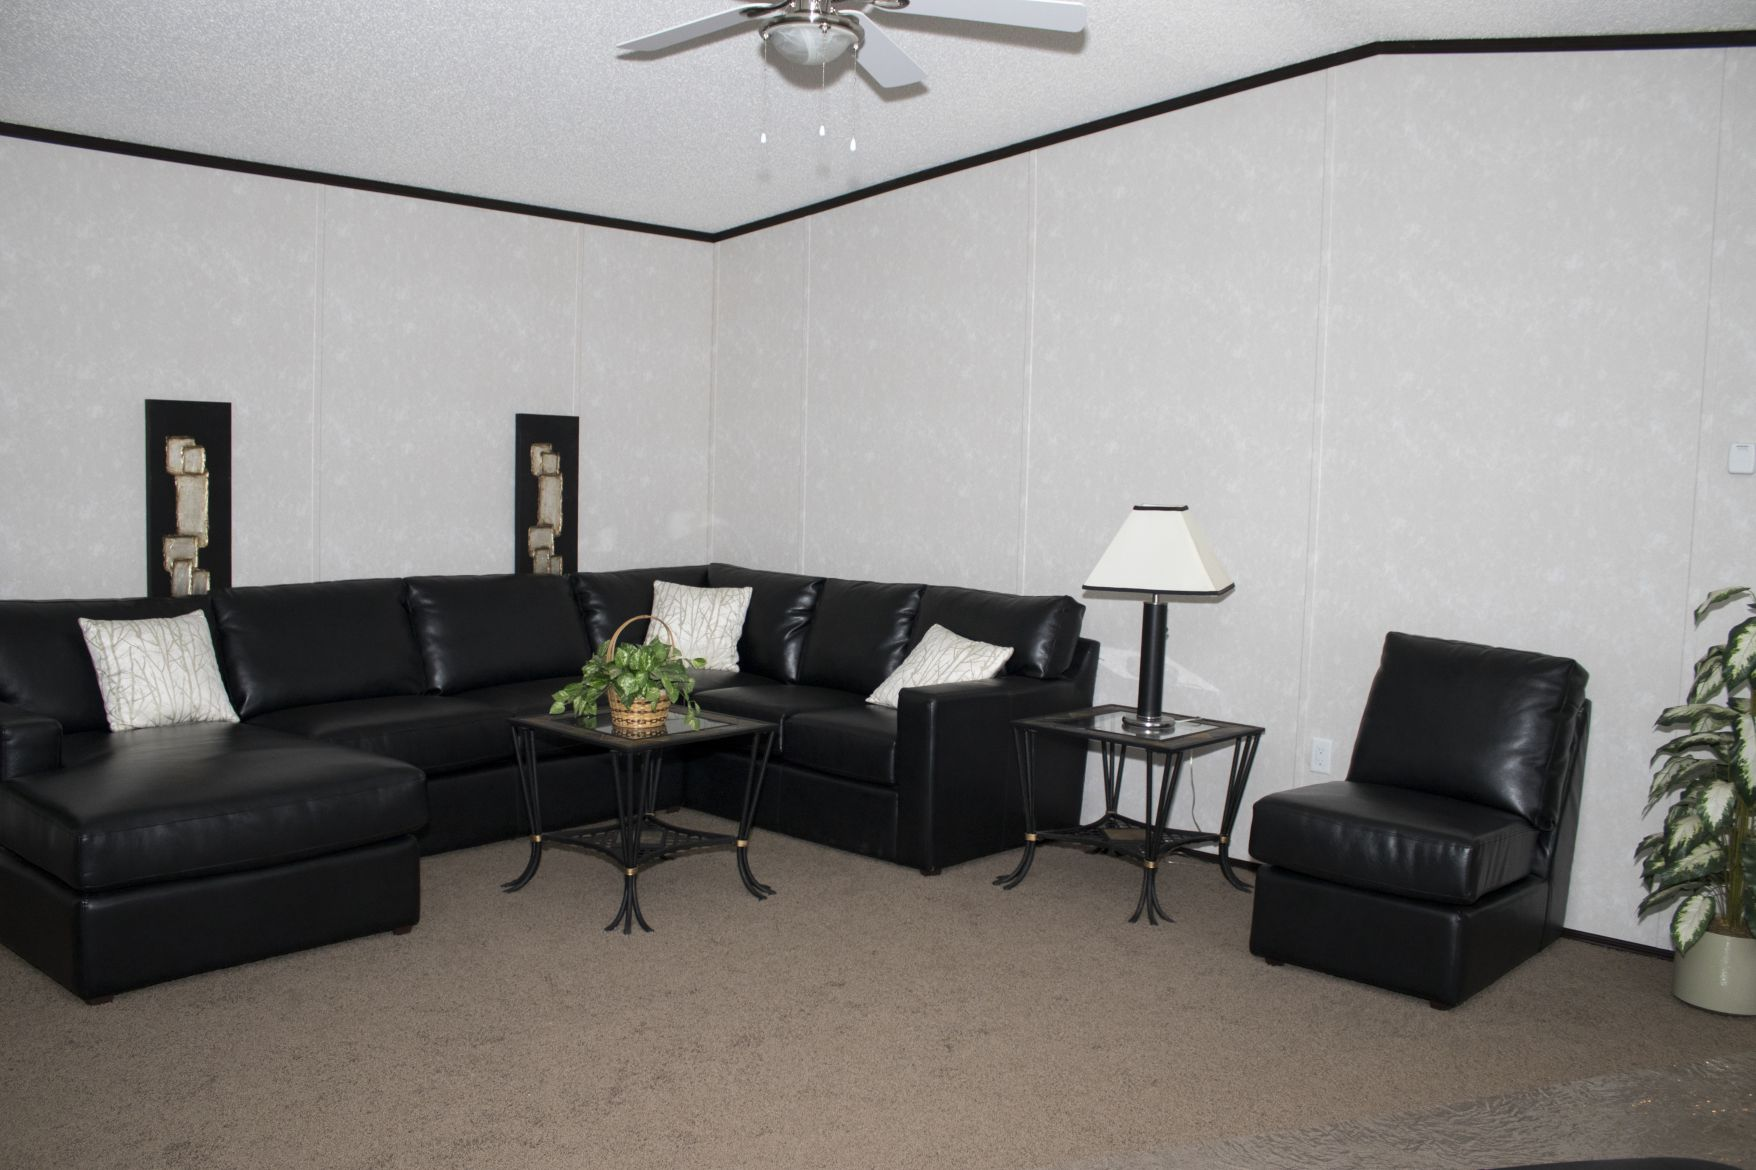 Living Room 2/2